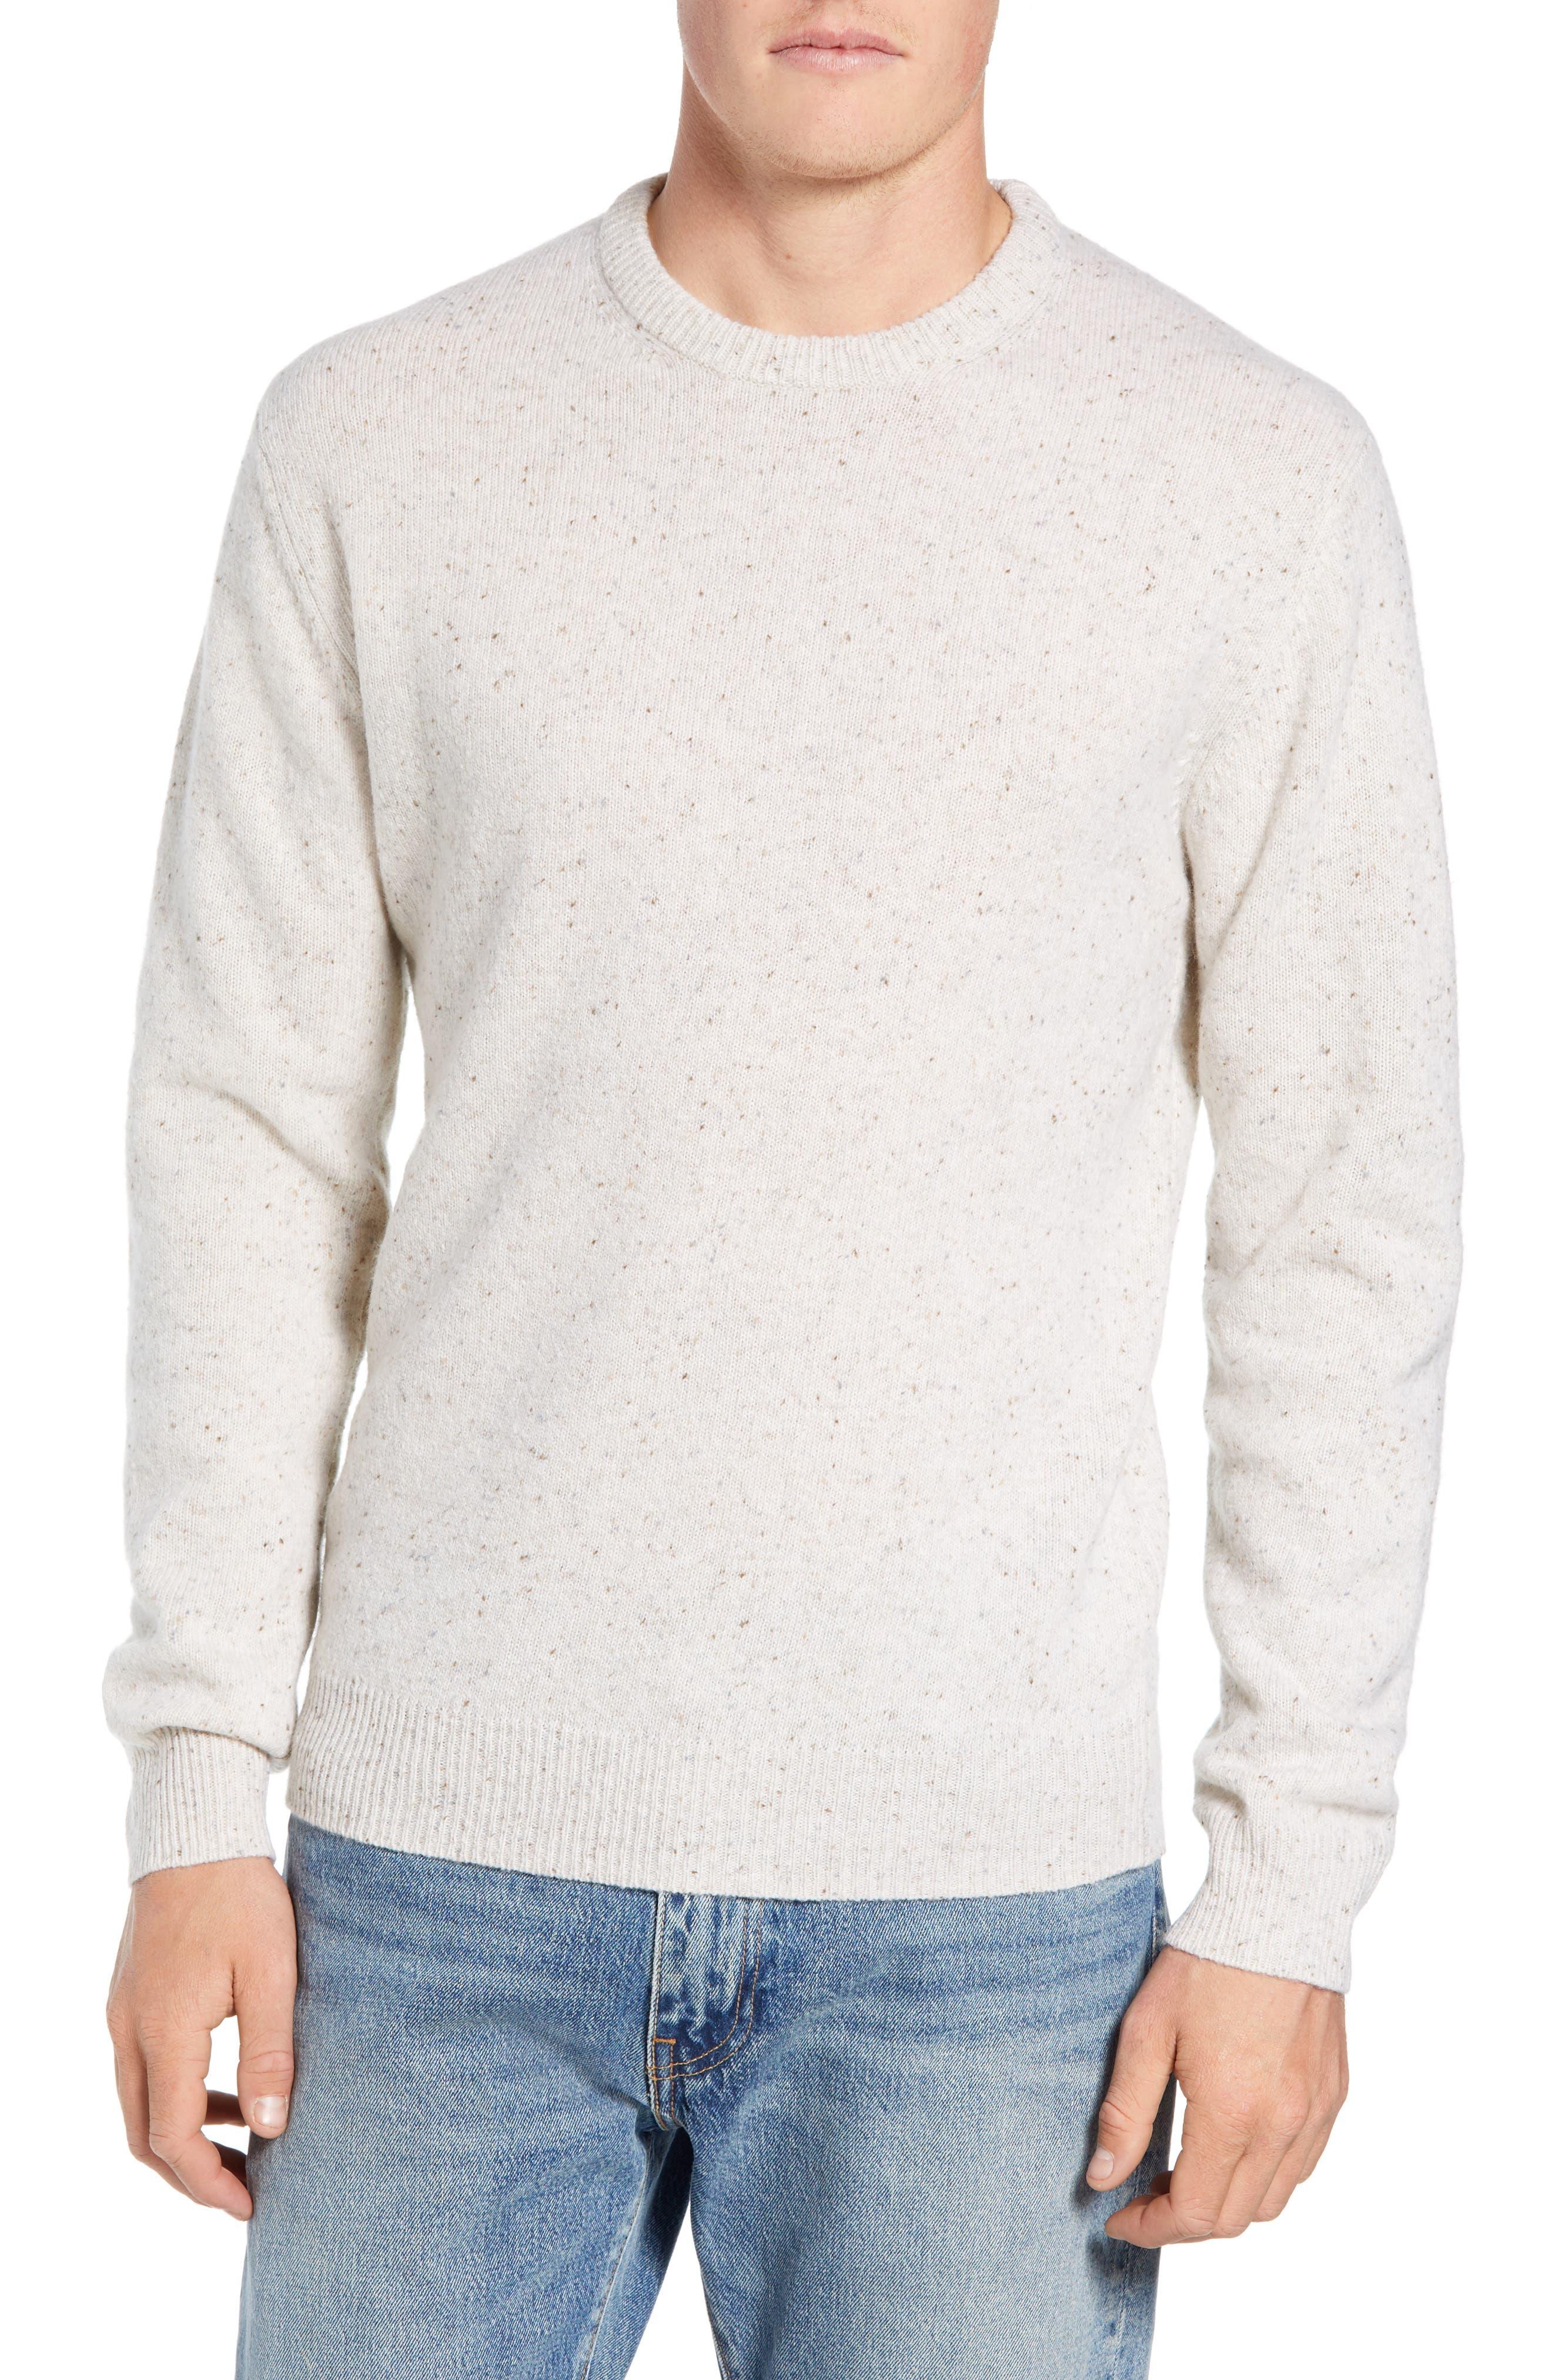 Donegal Sweater,                             Main thumbnail 1, color,                             CUBA WHITE